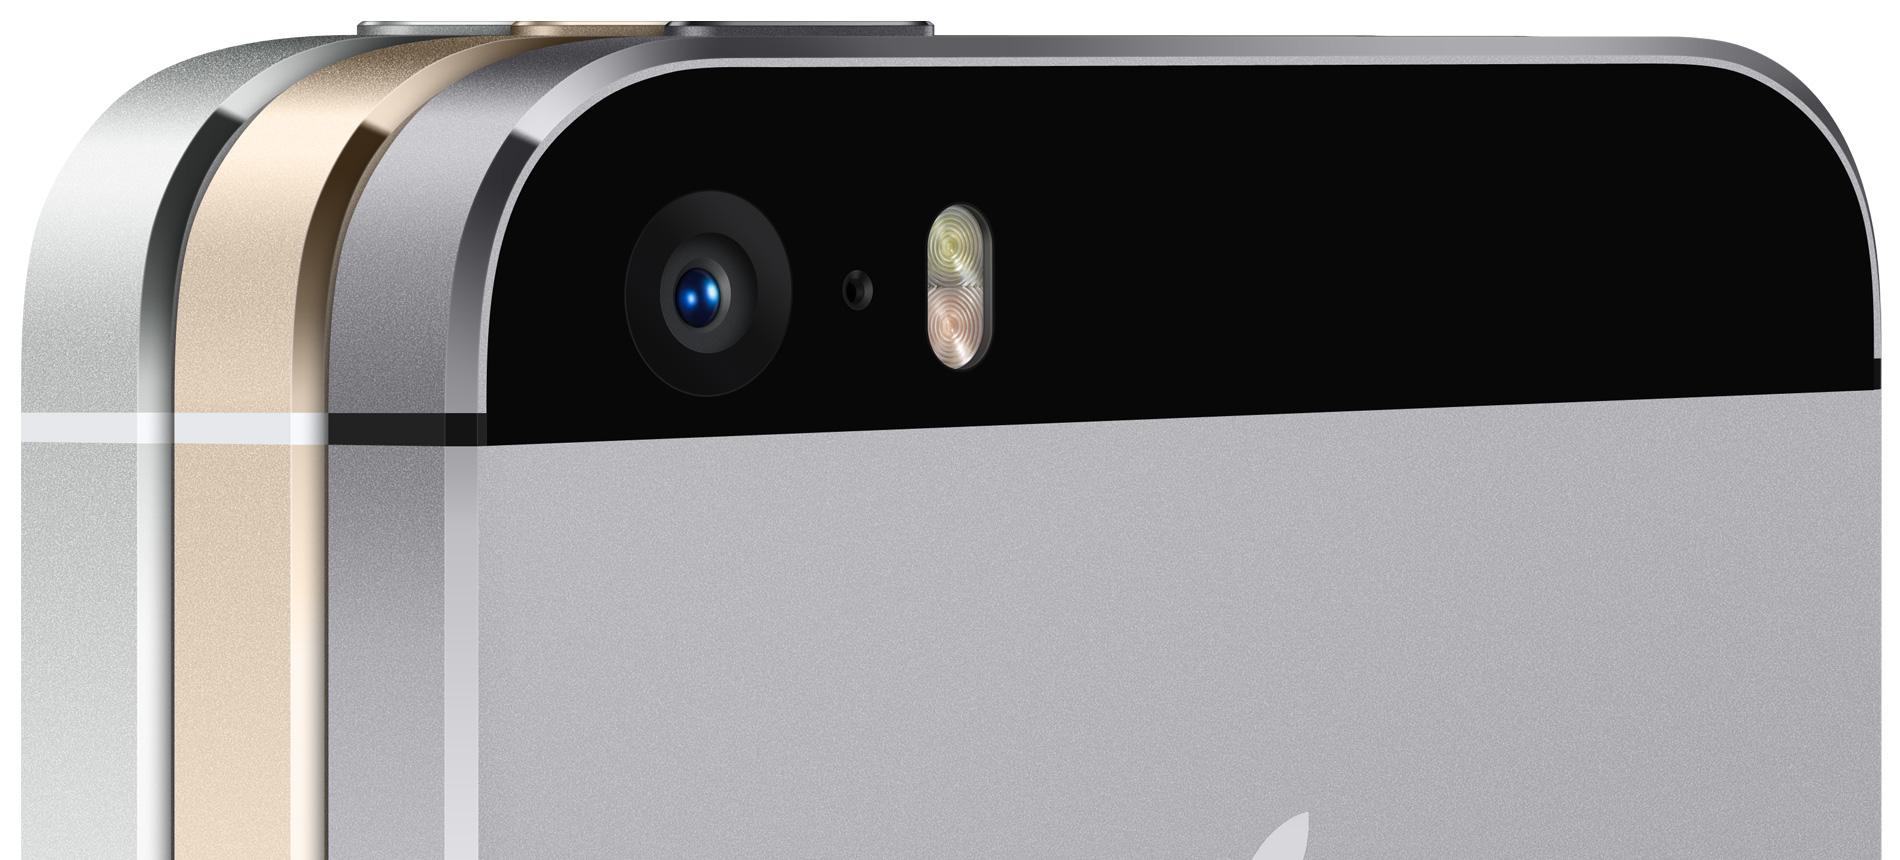 [KudoTranslate] 아이폰 5s의 카메라에 대한 사진가로서의 생각.